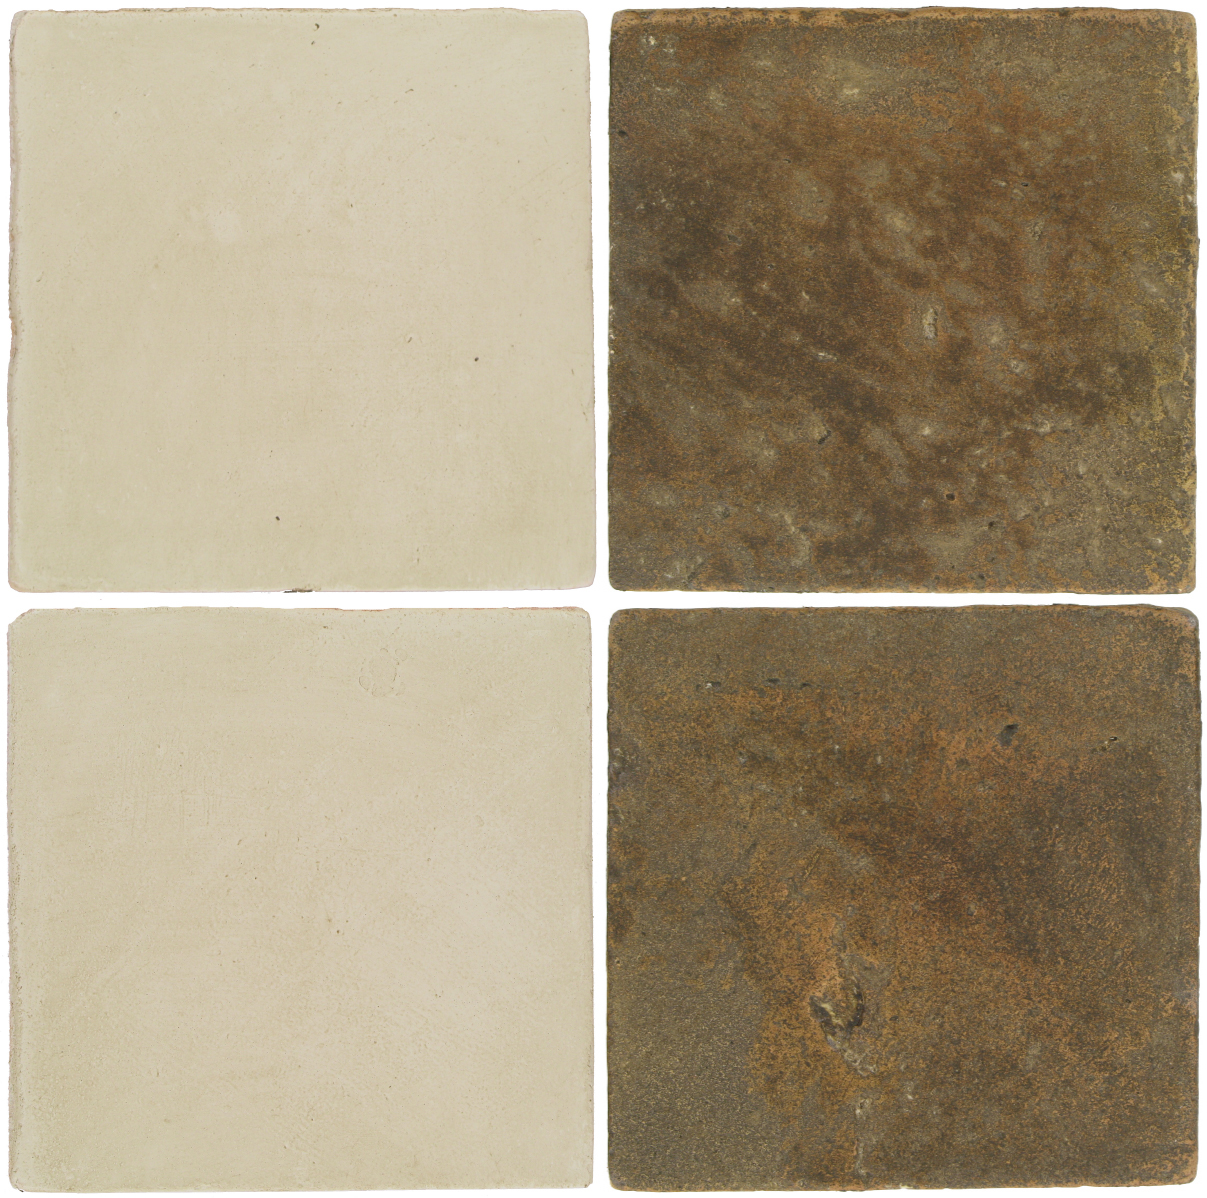 Pedralbes Antique Terracotta  2 Color Combinations  OHS-PGLW Glacier White + VTG-PSVN Verona Brown